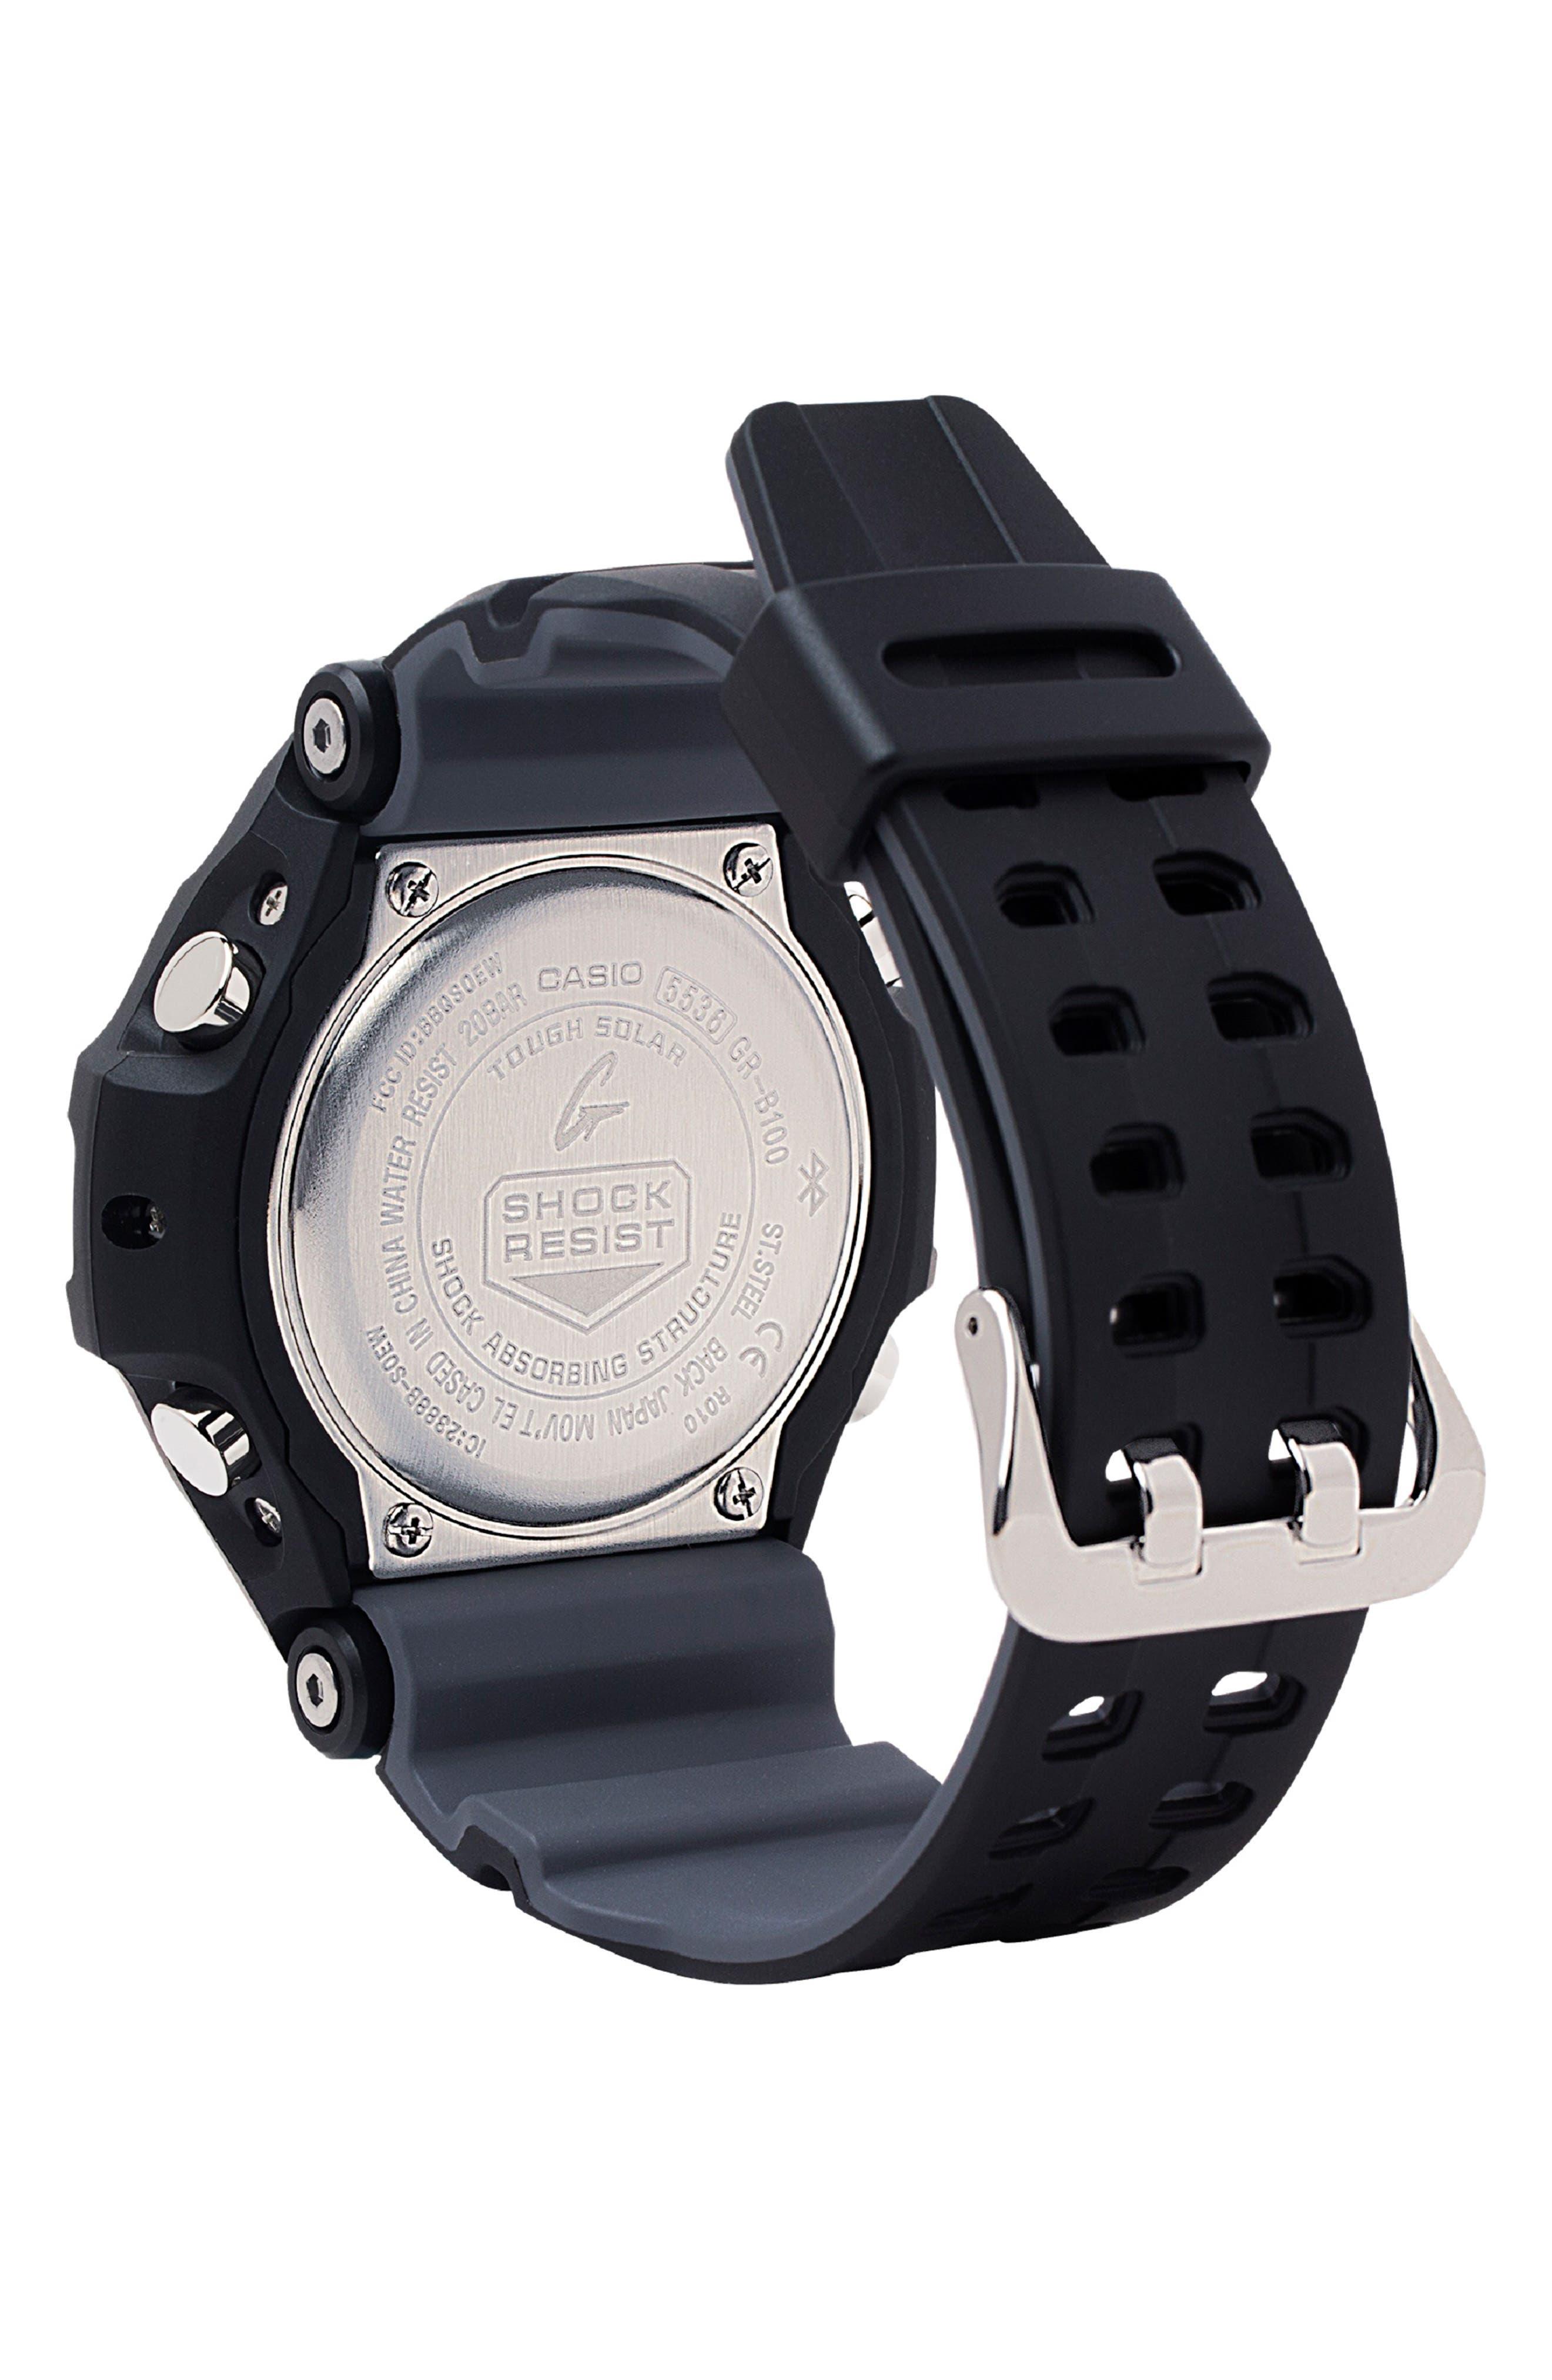 G-SHOCK BABY-G, G-Shock GravityMaster Ana-Digi Bluetooth<sup>®</sup> Enabled Resin Strap Watch, 49mm, Alternate thumbnail 2, color, BLACK MULTI